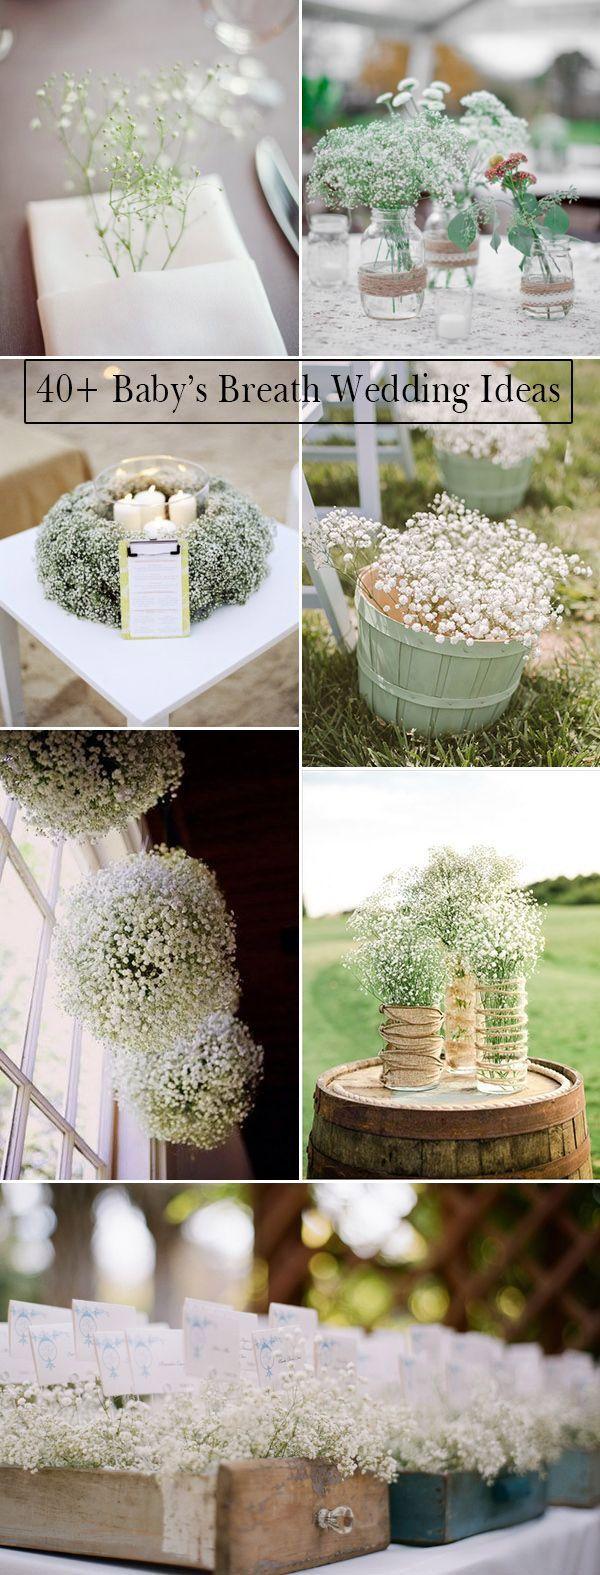 Wedding Flowers 40 Ideas To Use Babys Breath Karla Anthony